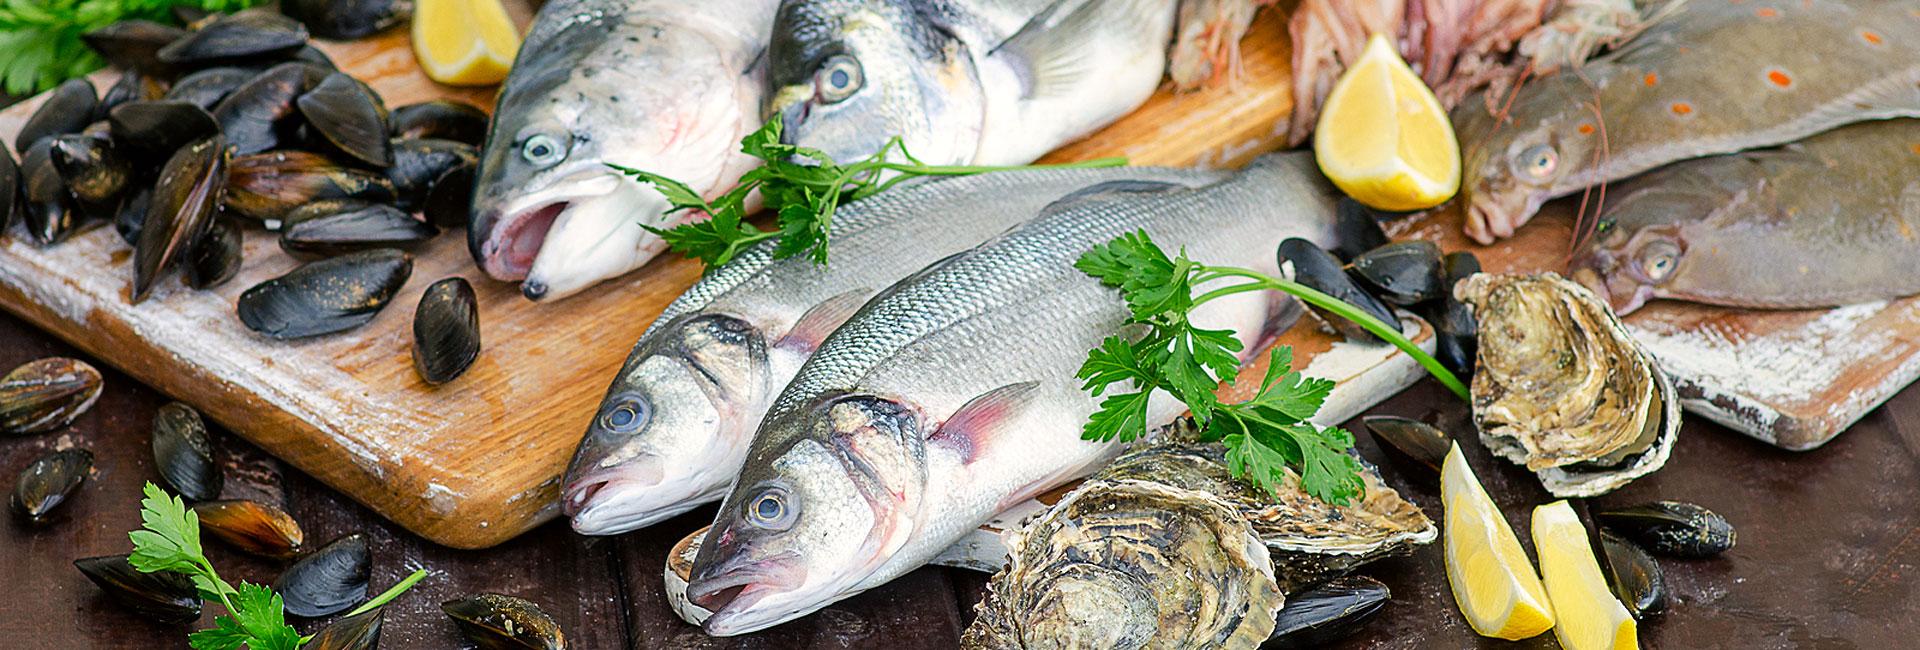 Guernsey Wholesale Fishmongers | Manor Farm Fish